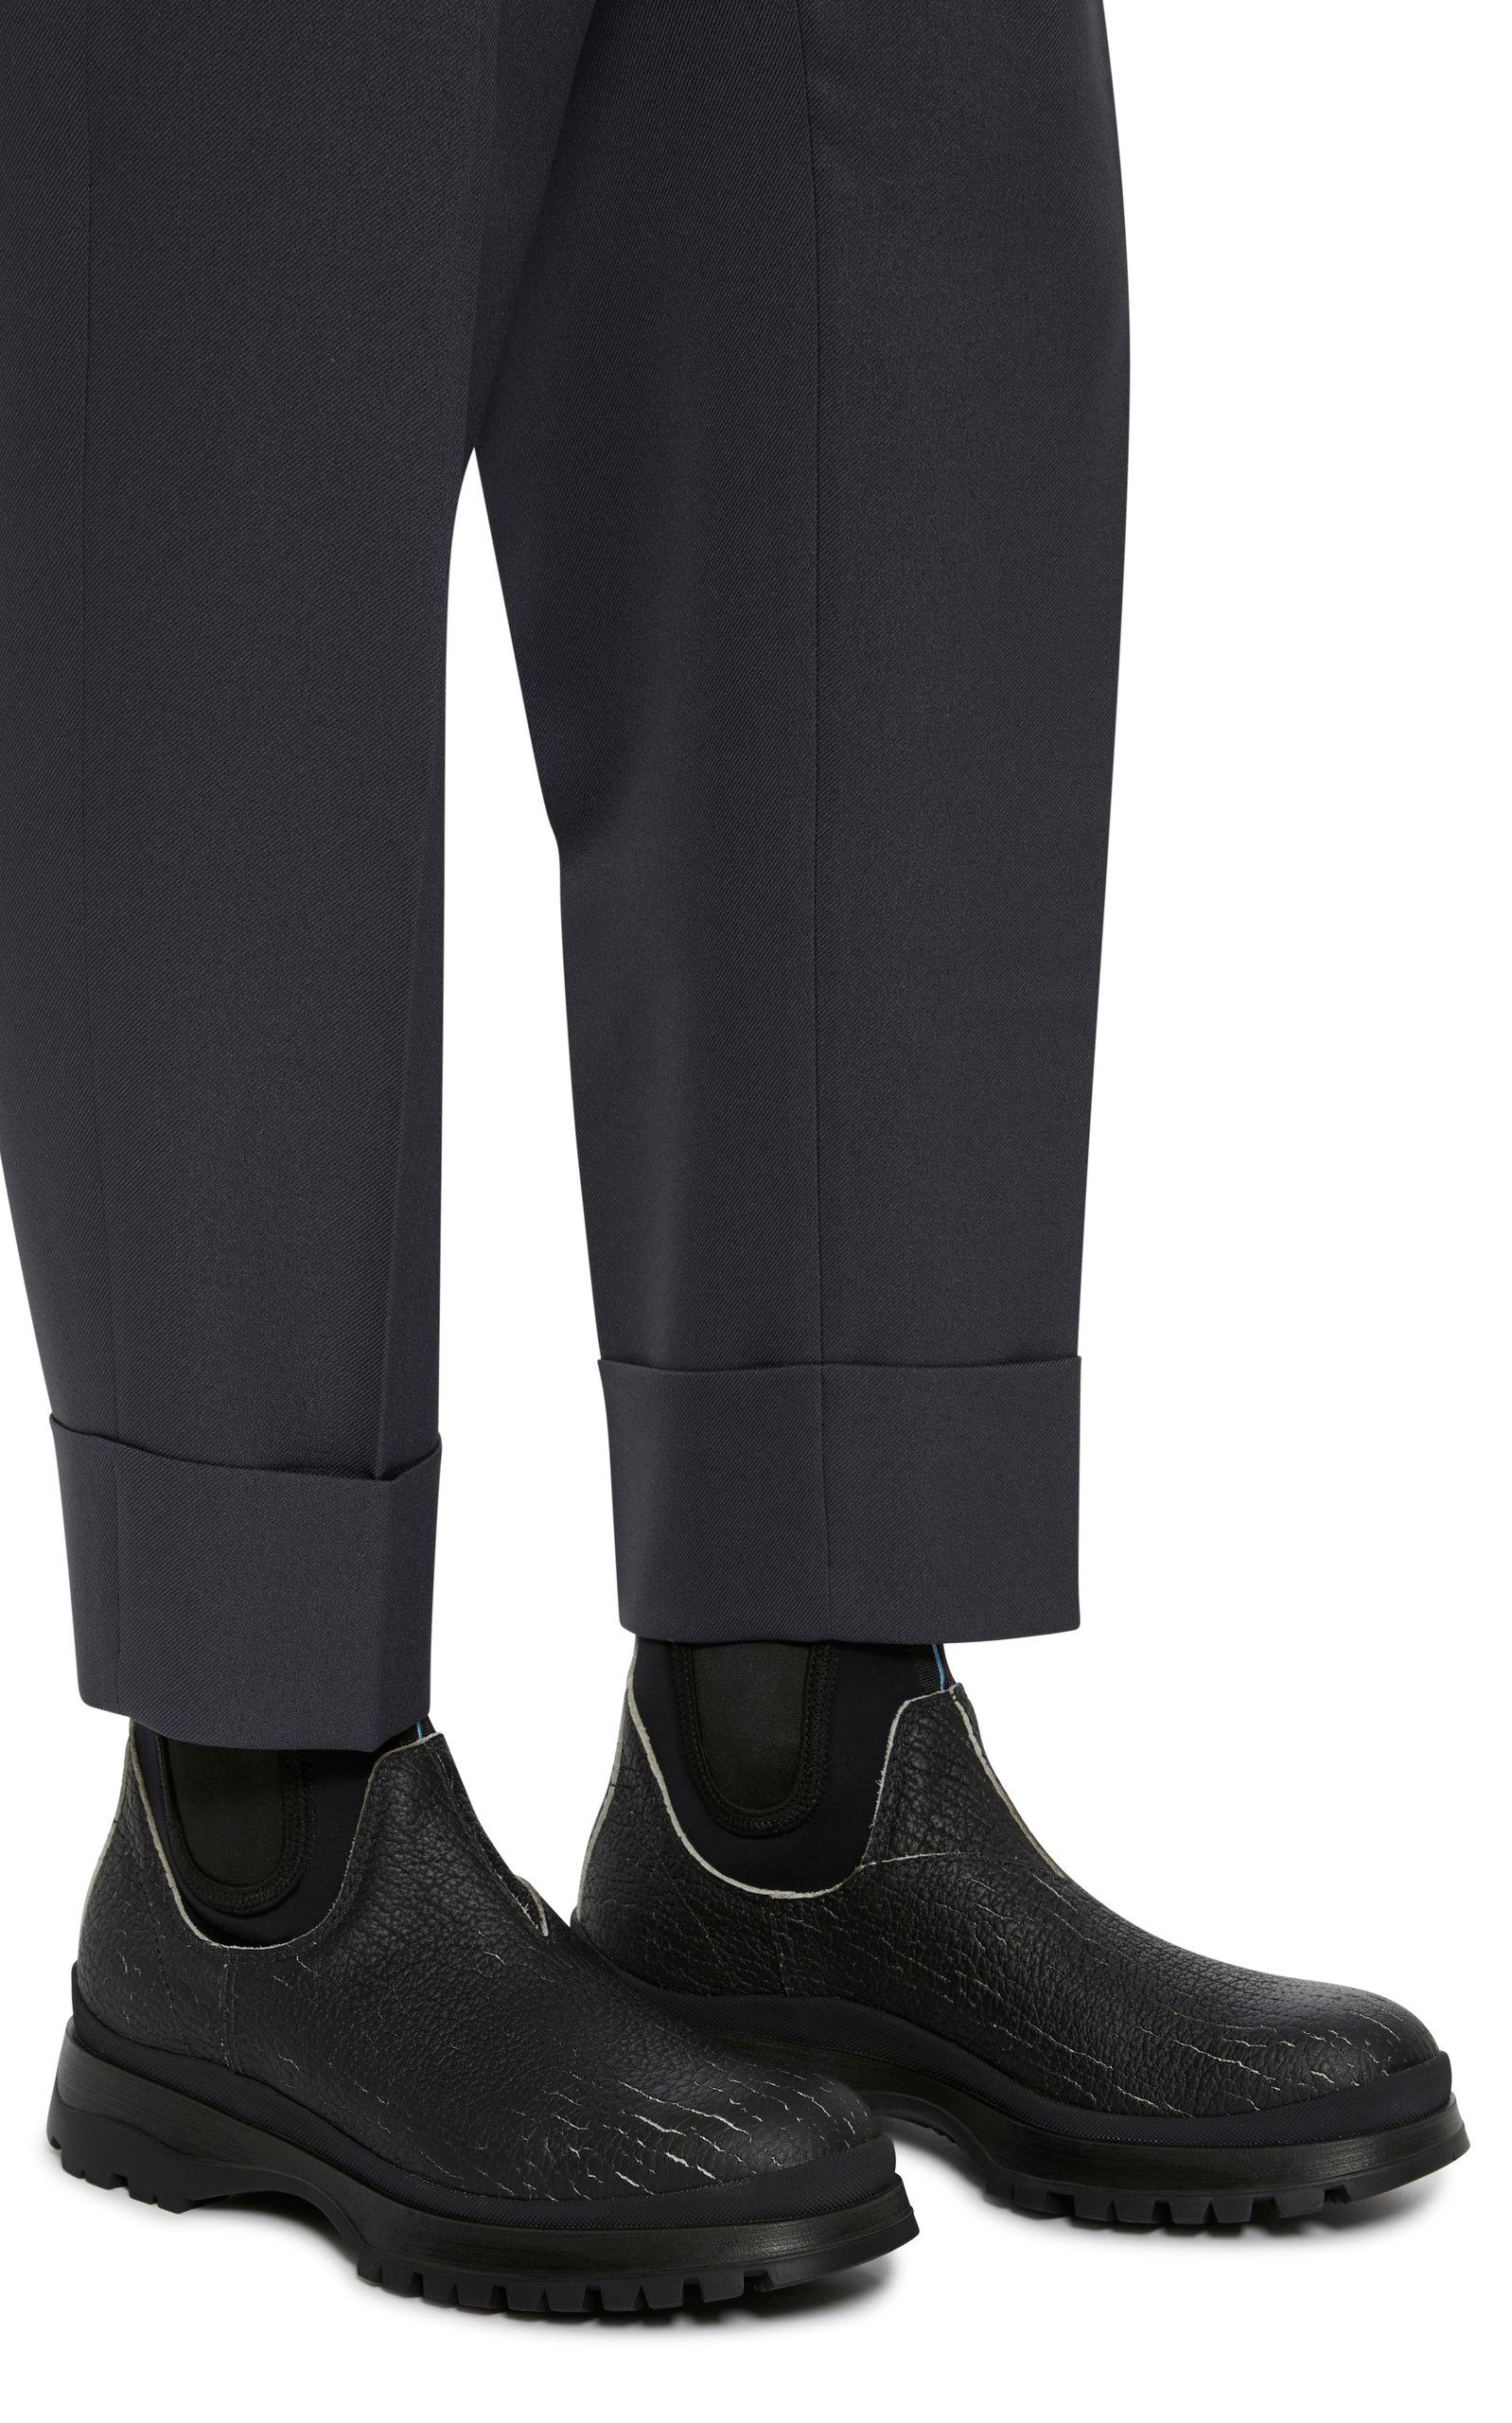 31bcf9738ef6 Leather And Neoprene Chelsea Boots by Prada | Moda Operandi